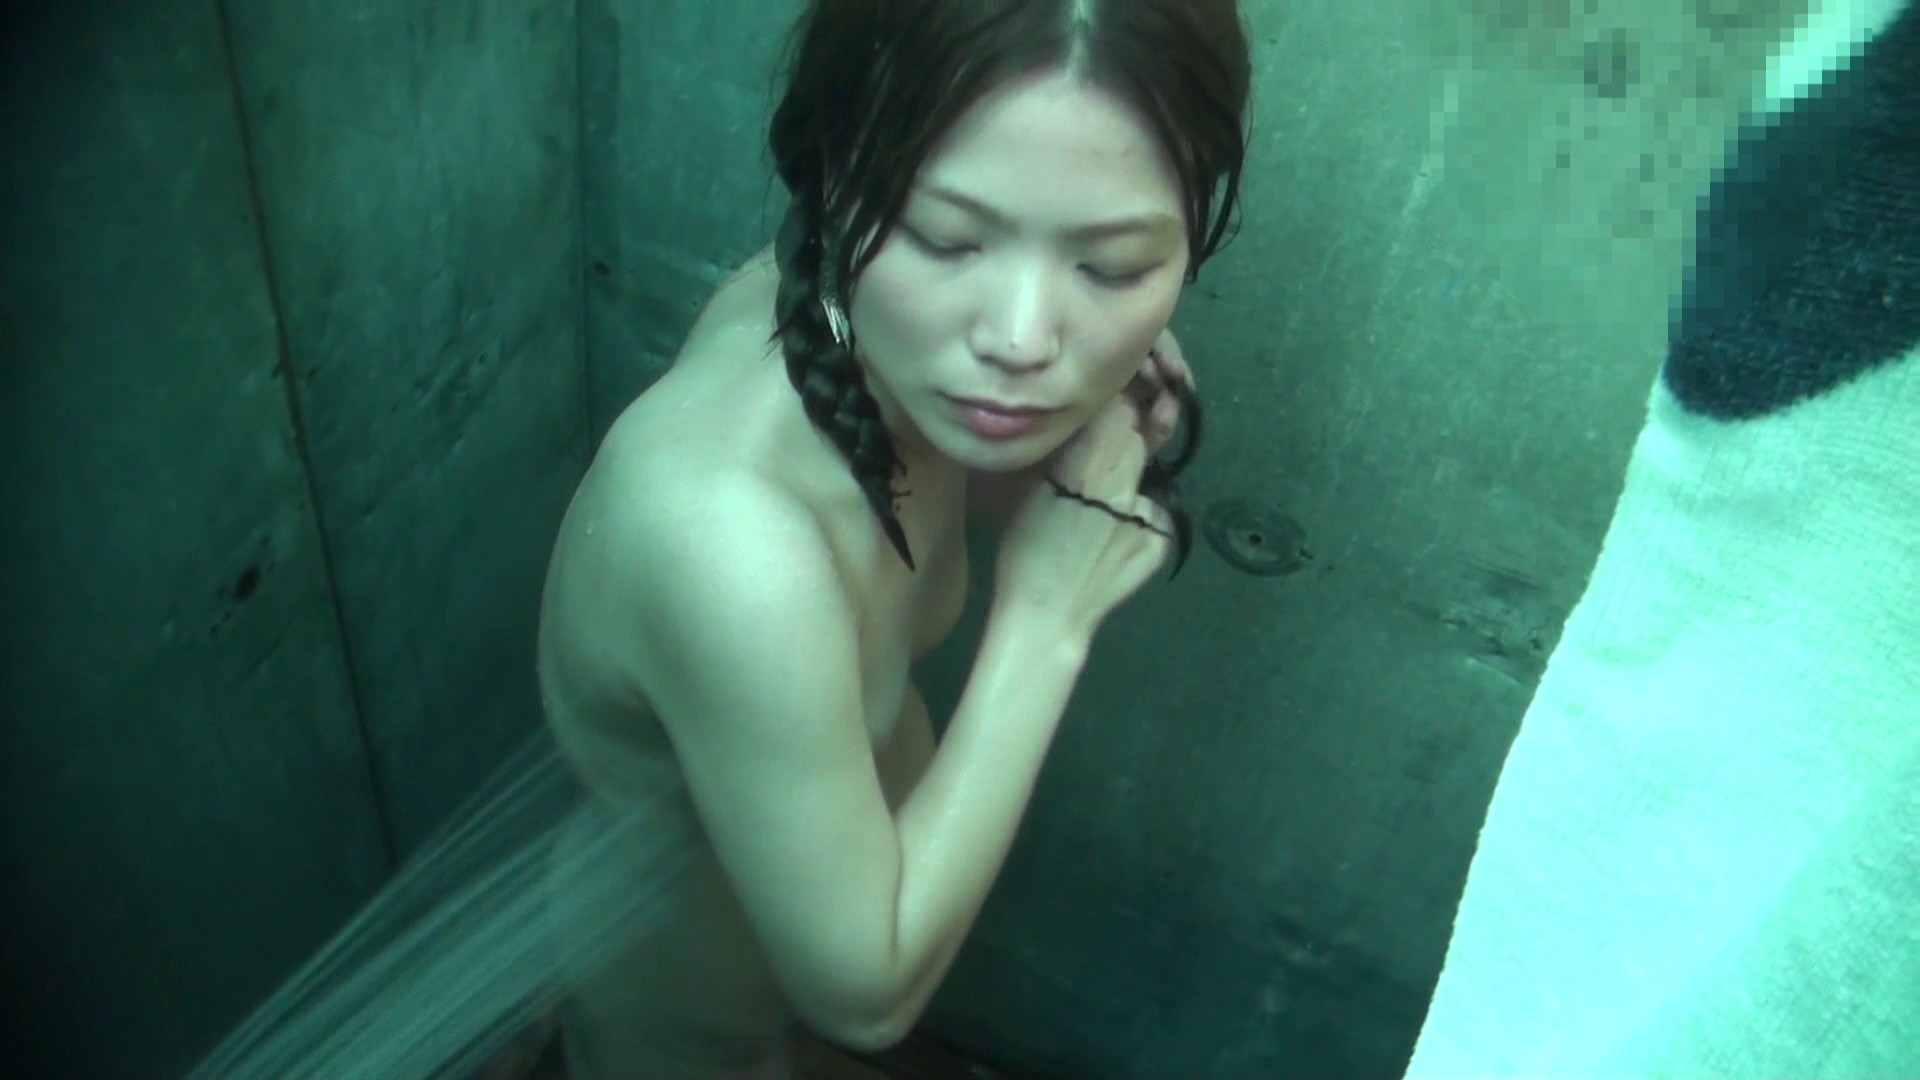 Vol.12 女性の性器には予想外の砂が混入しているようです。 シャワー室 AV動画キャプチャ 111枚 61